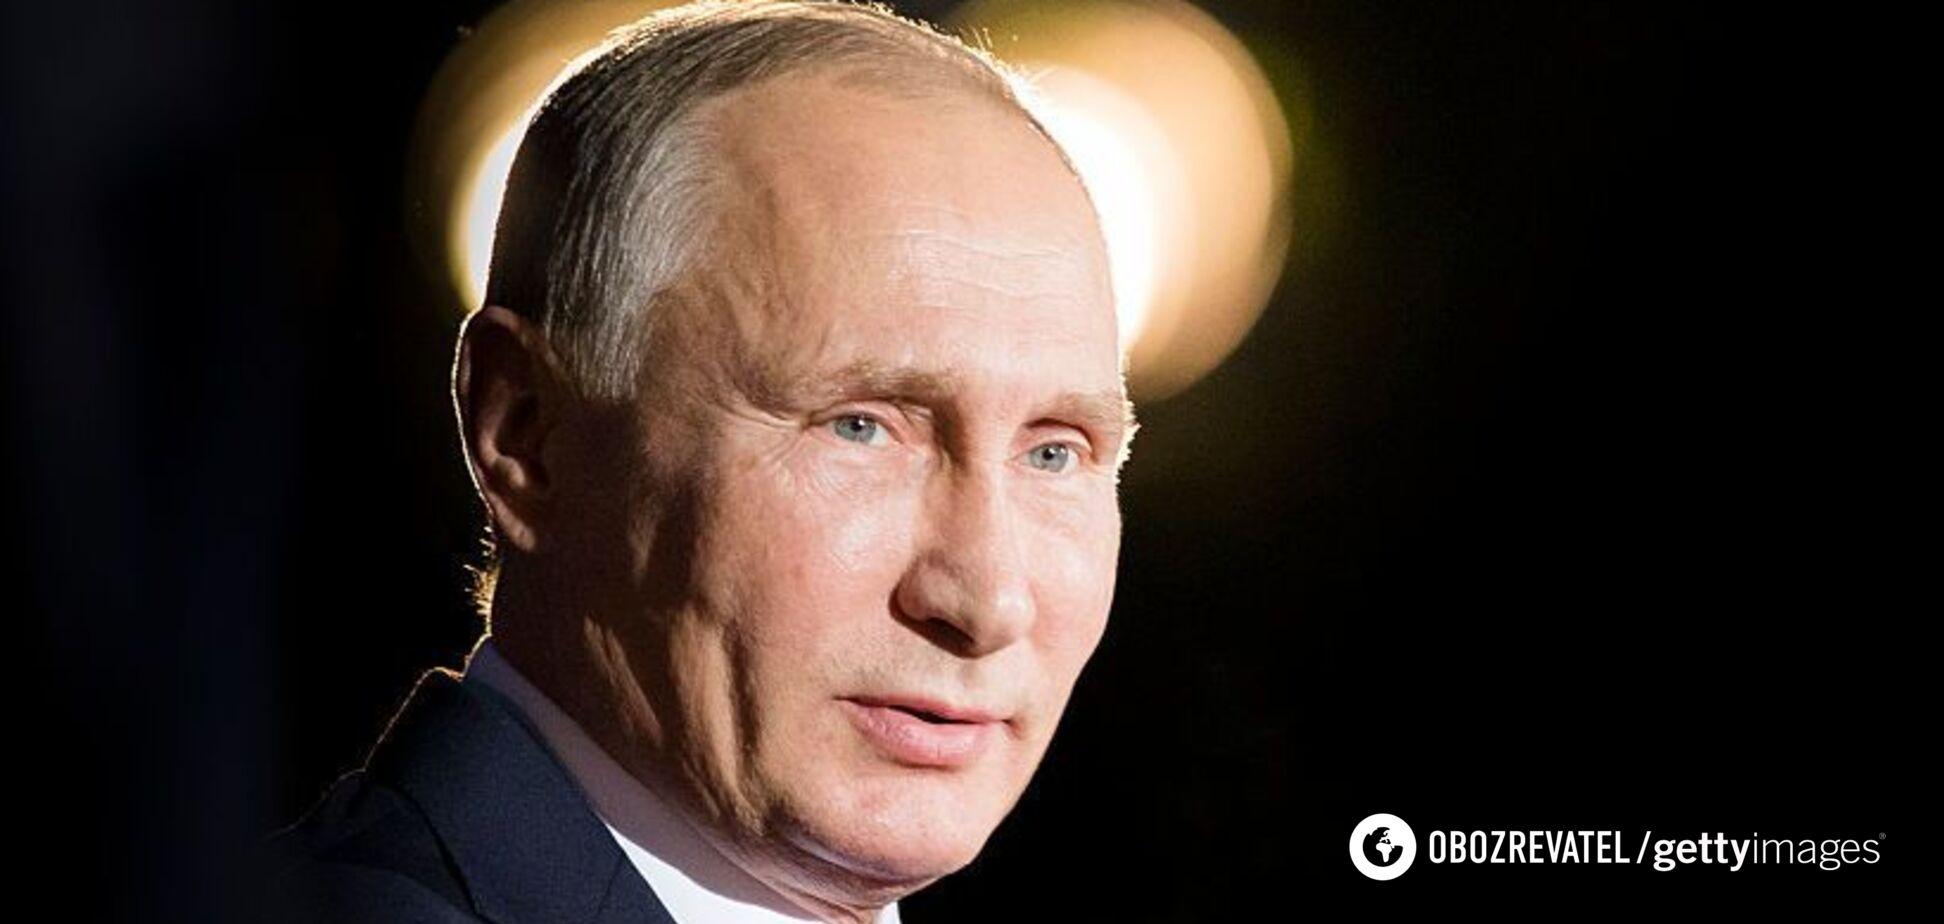 История болезни Путина